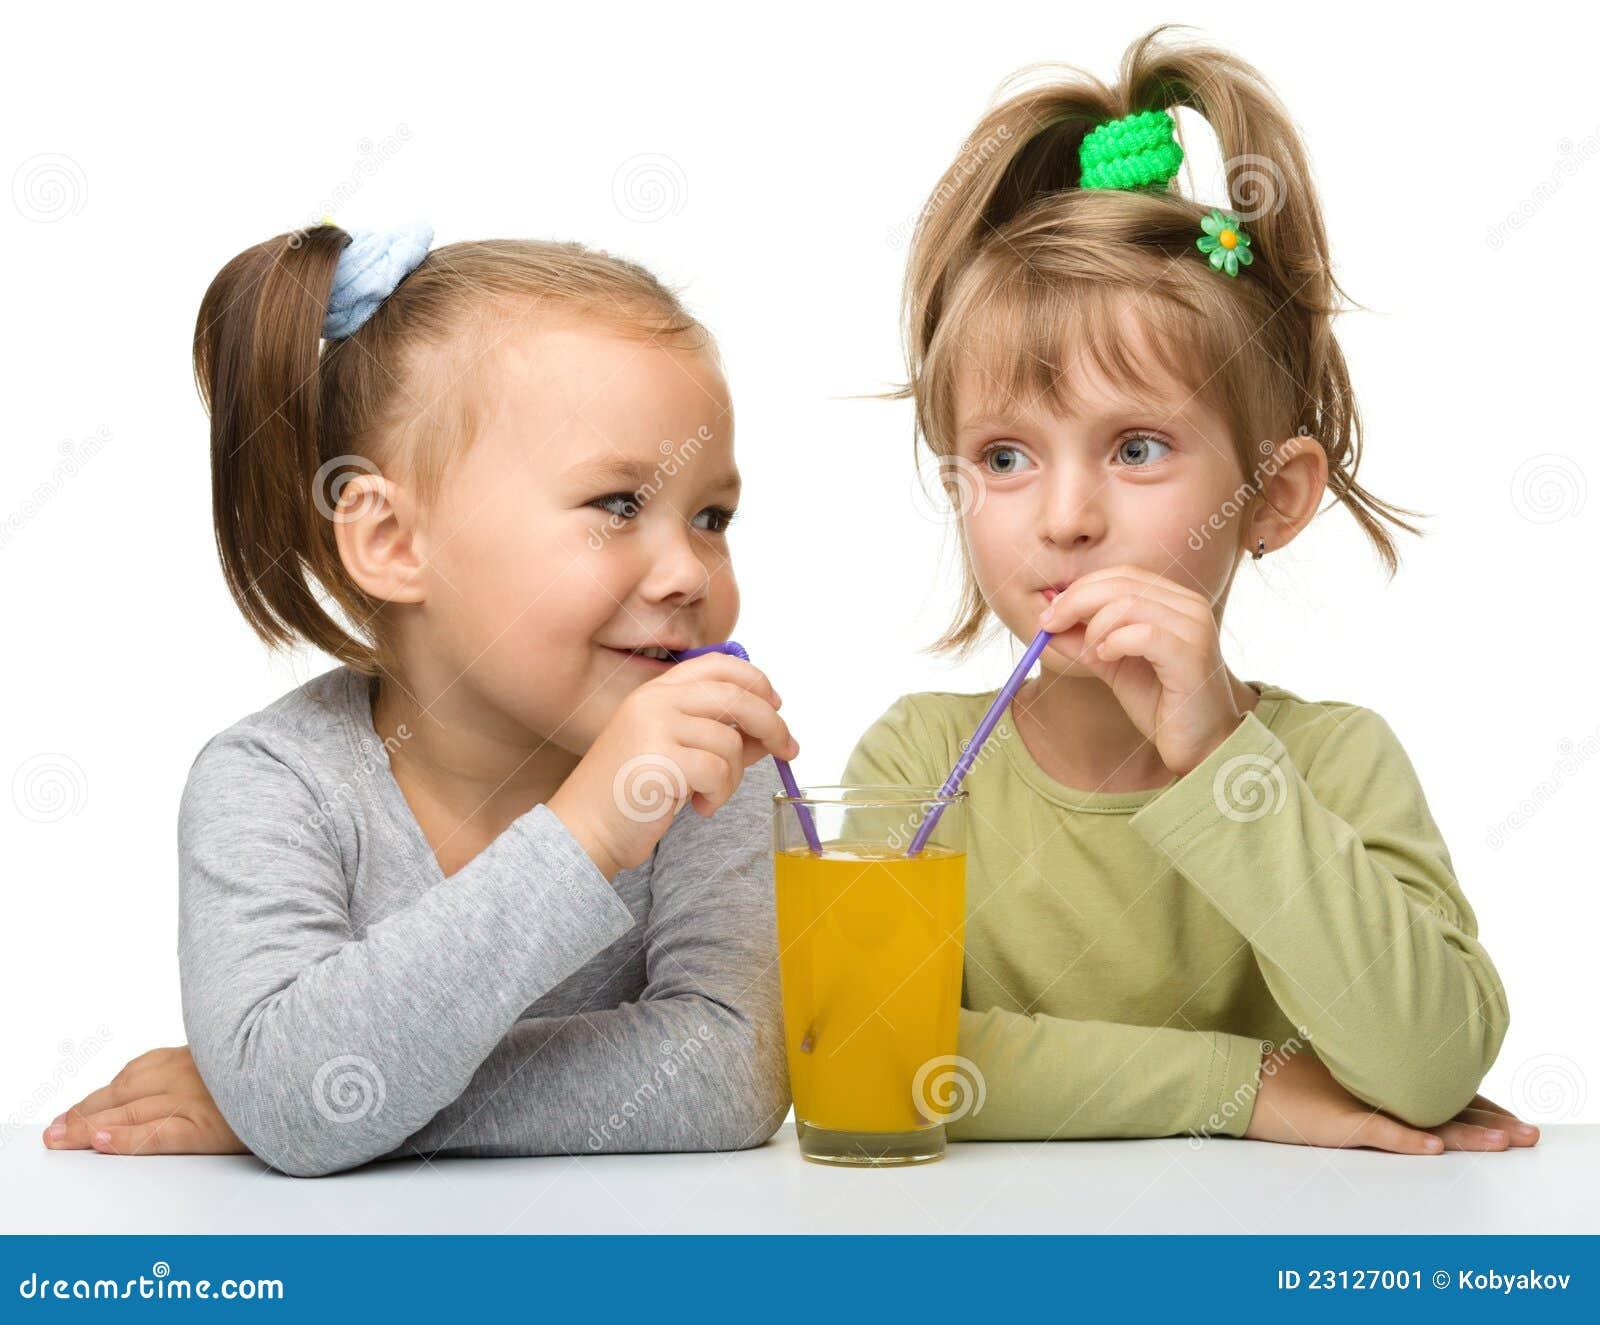 Two little girls are drinking orange juice